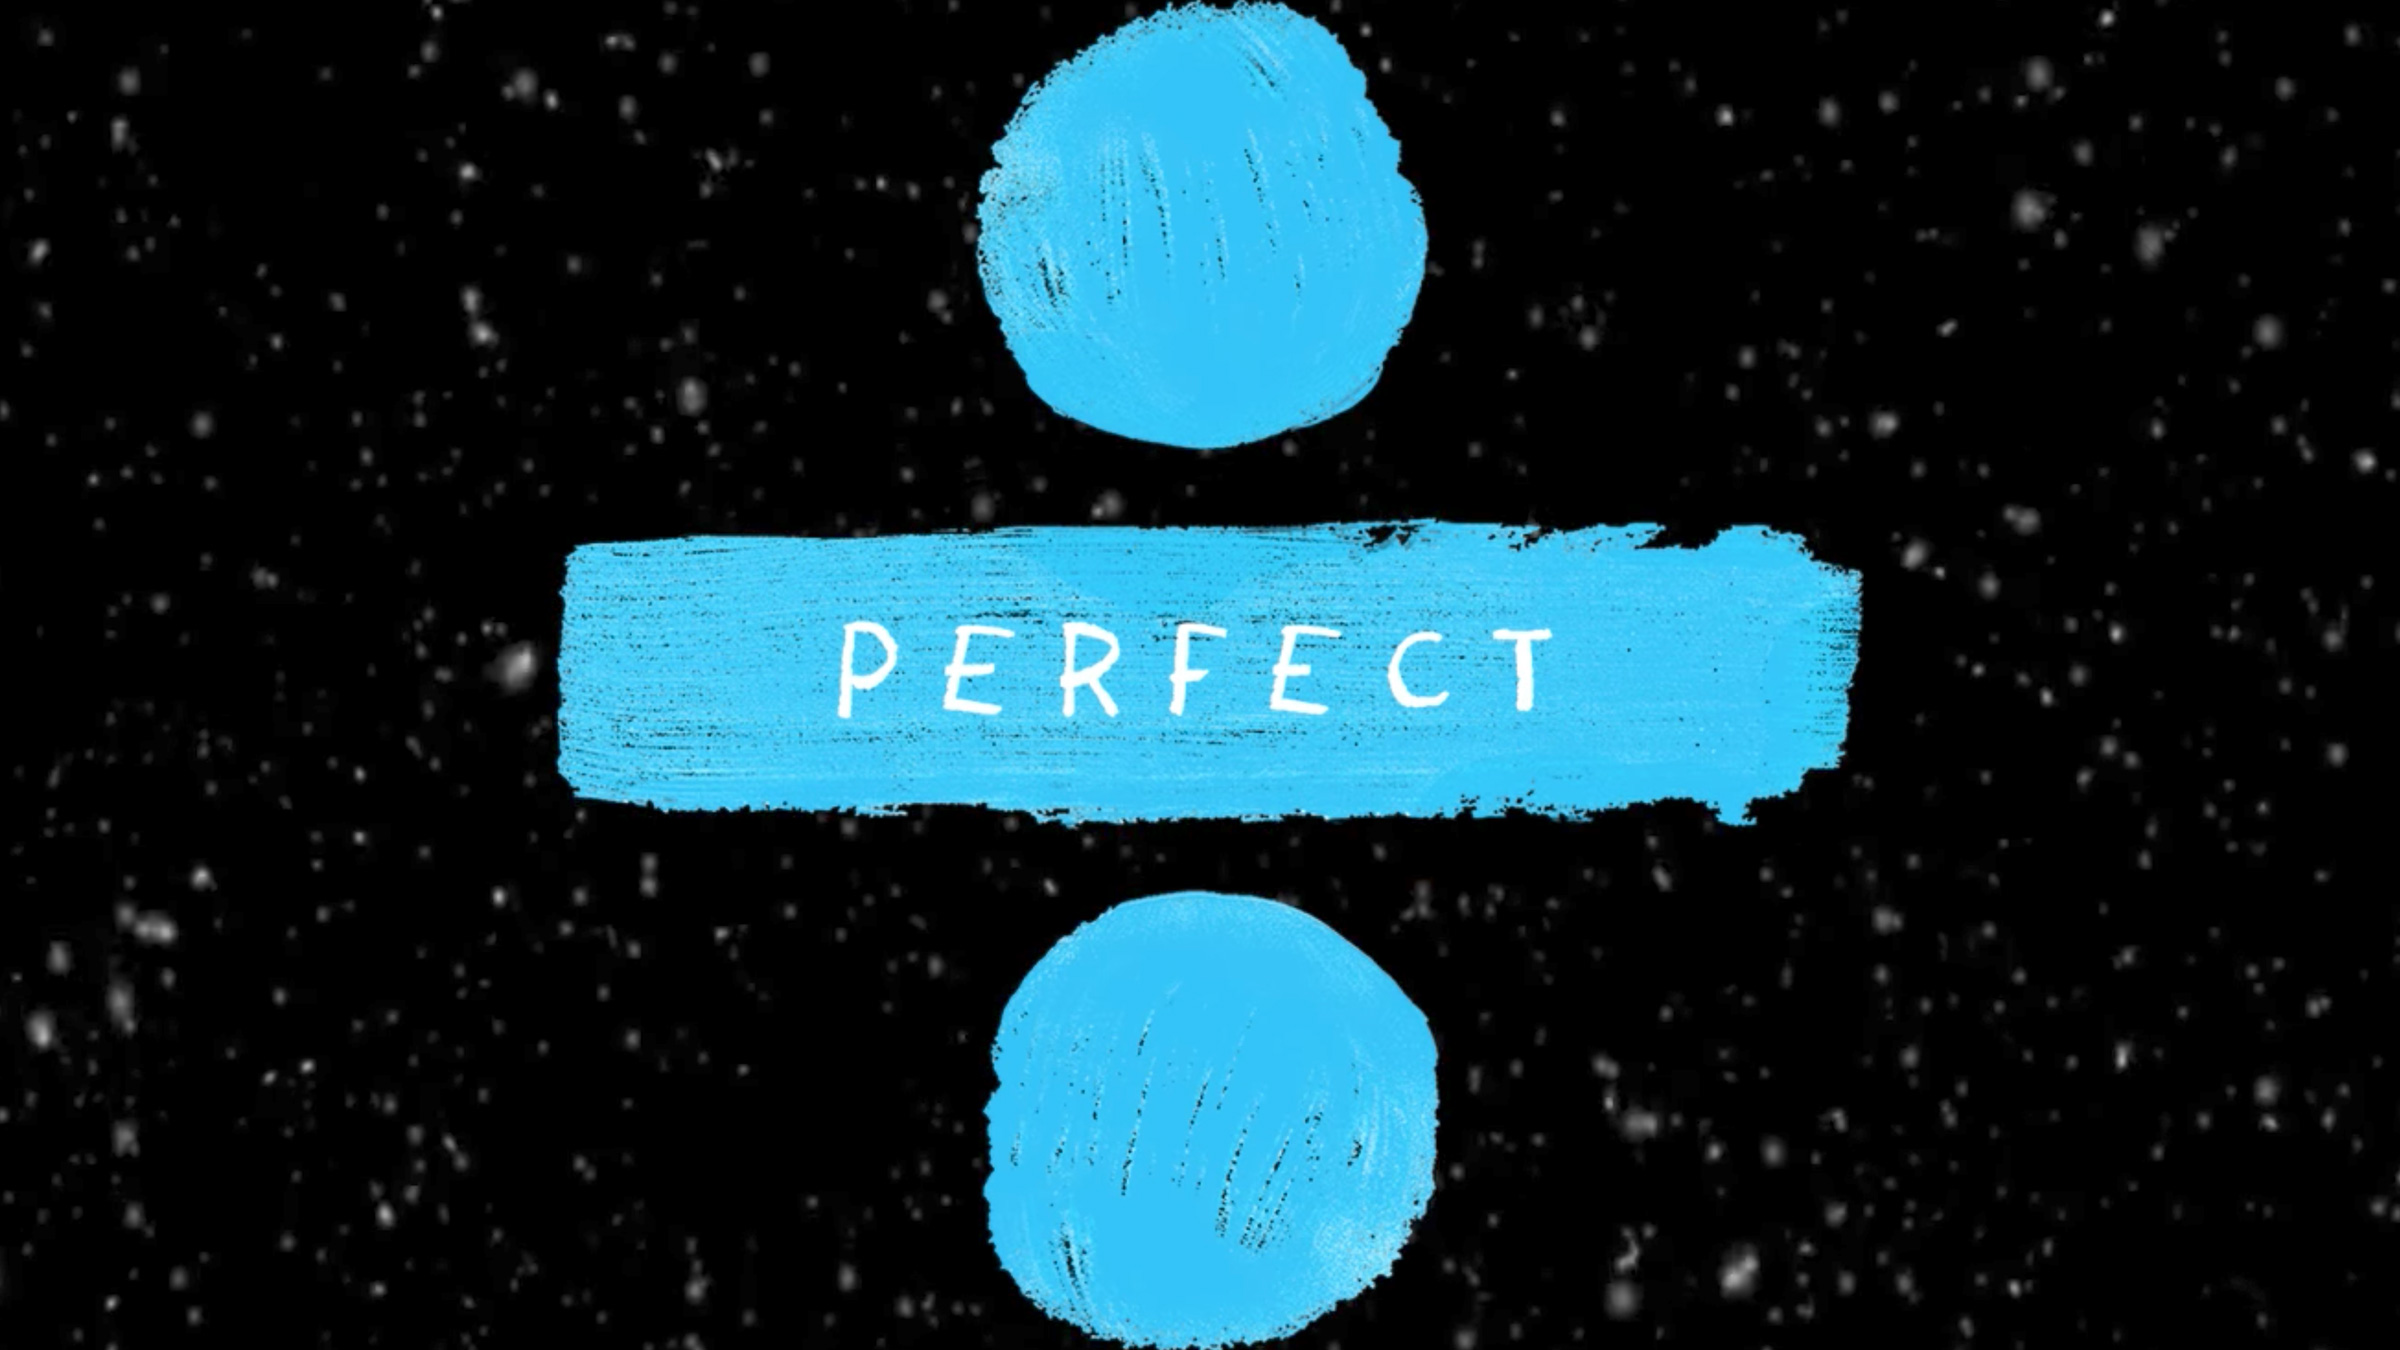 Edsheeranperfect